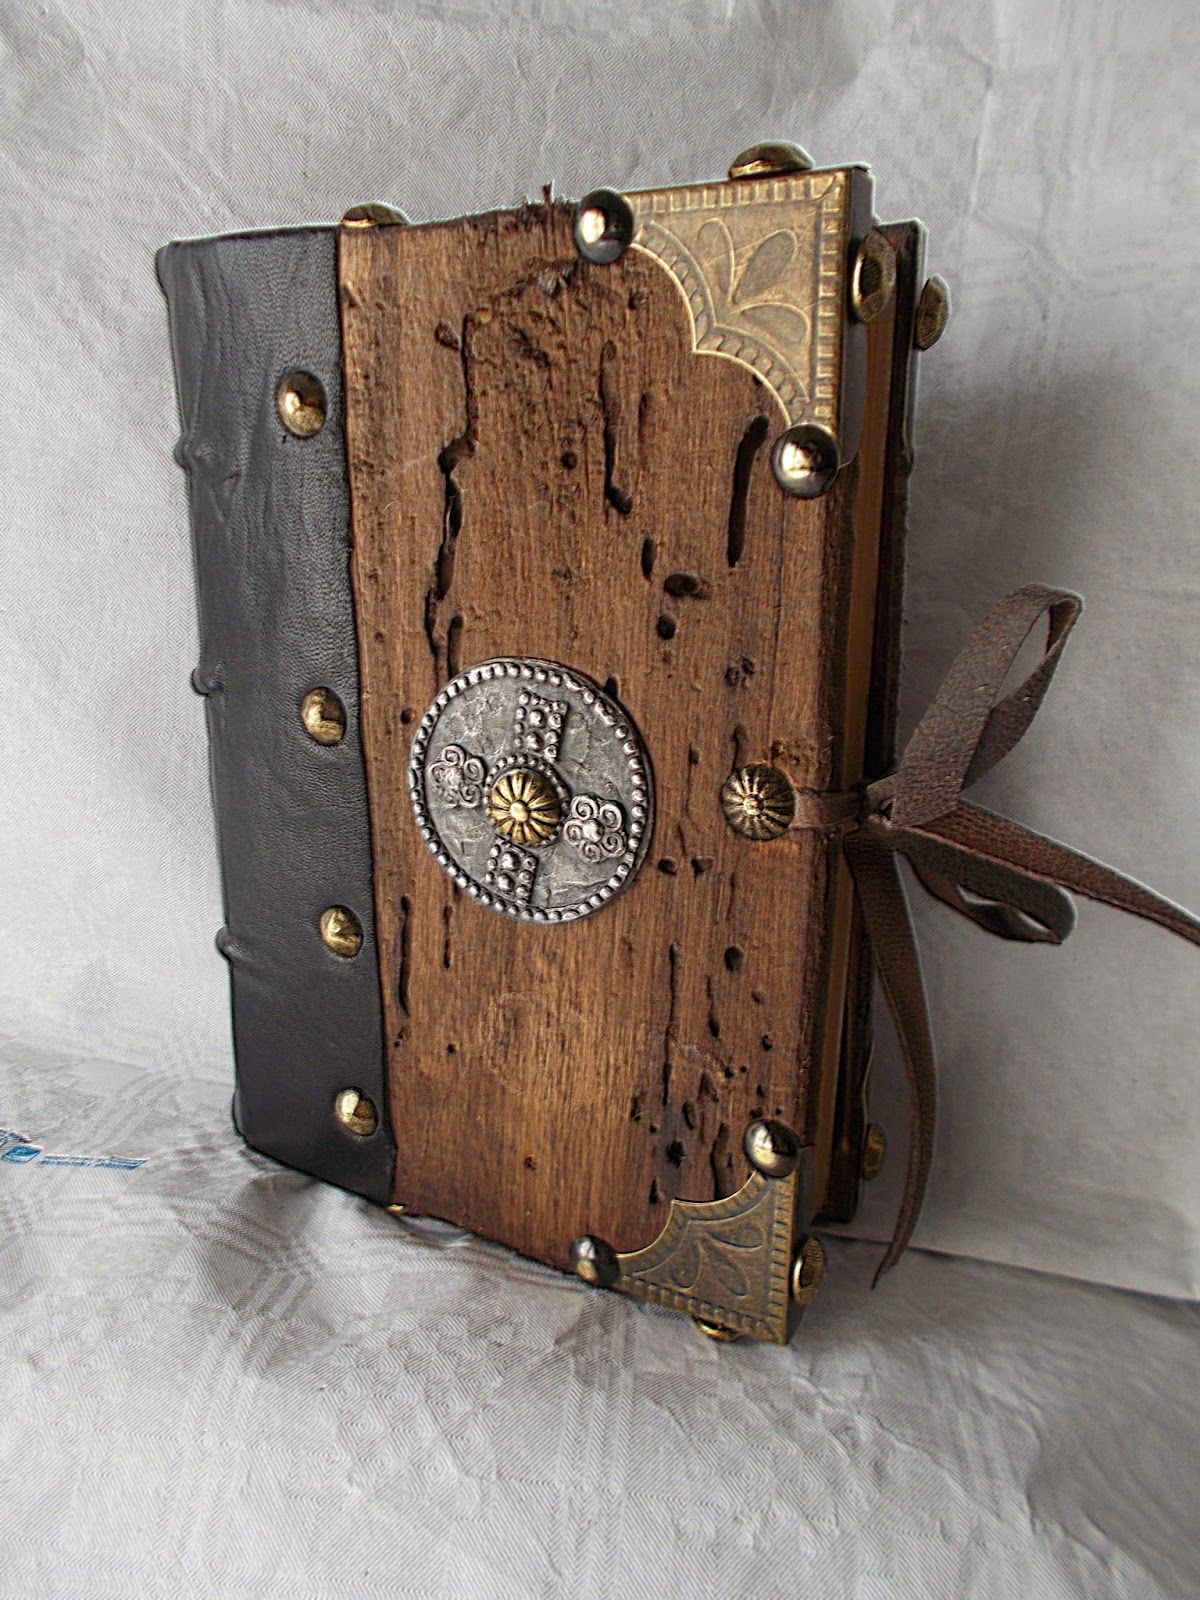 Jo Malossi Et Amicorum Chalemagne S Book Handmade Bookbinding Wood Wood Book Handmade Books Leather Journal